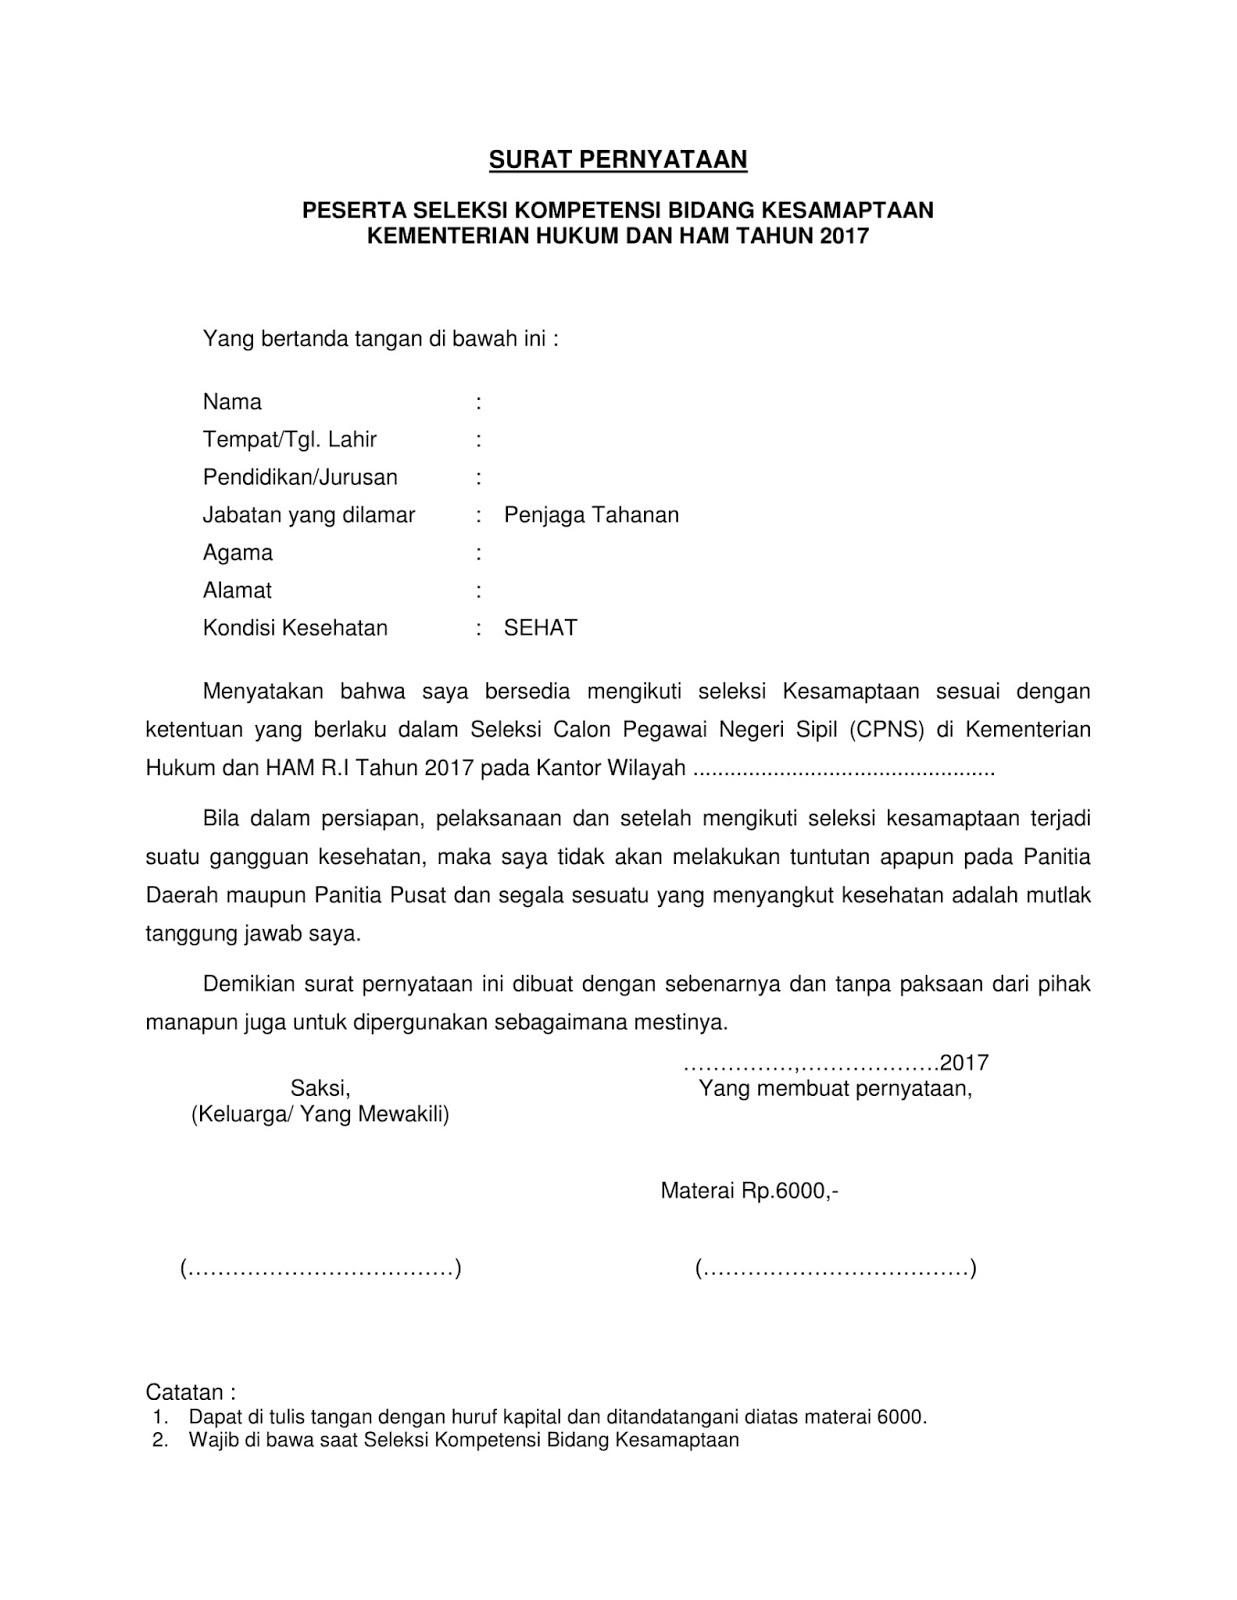 Contoh Surat Pernyataan Seleksi Kesamaptaan CPNS Kemenkumham [Silakan Download]